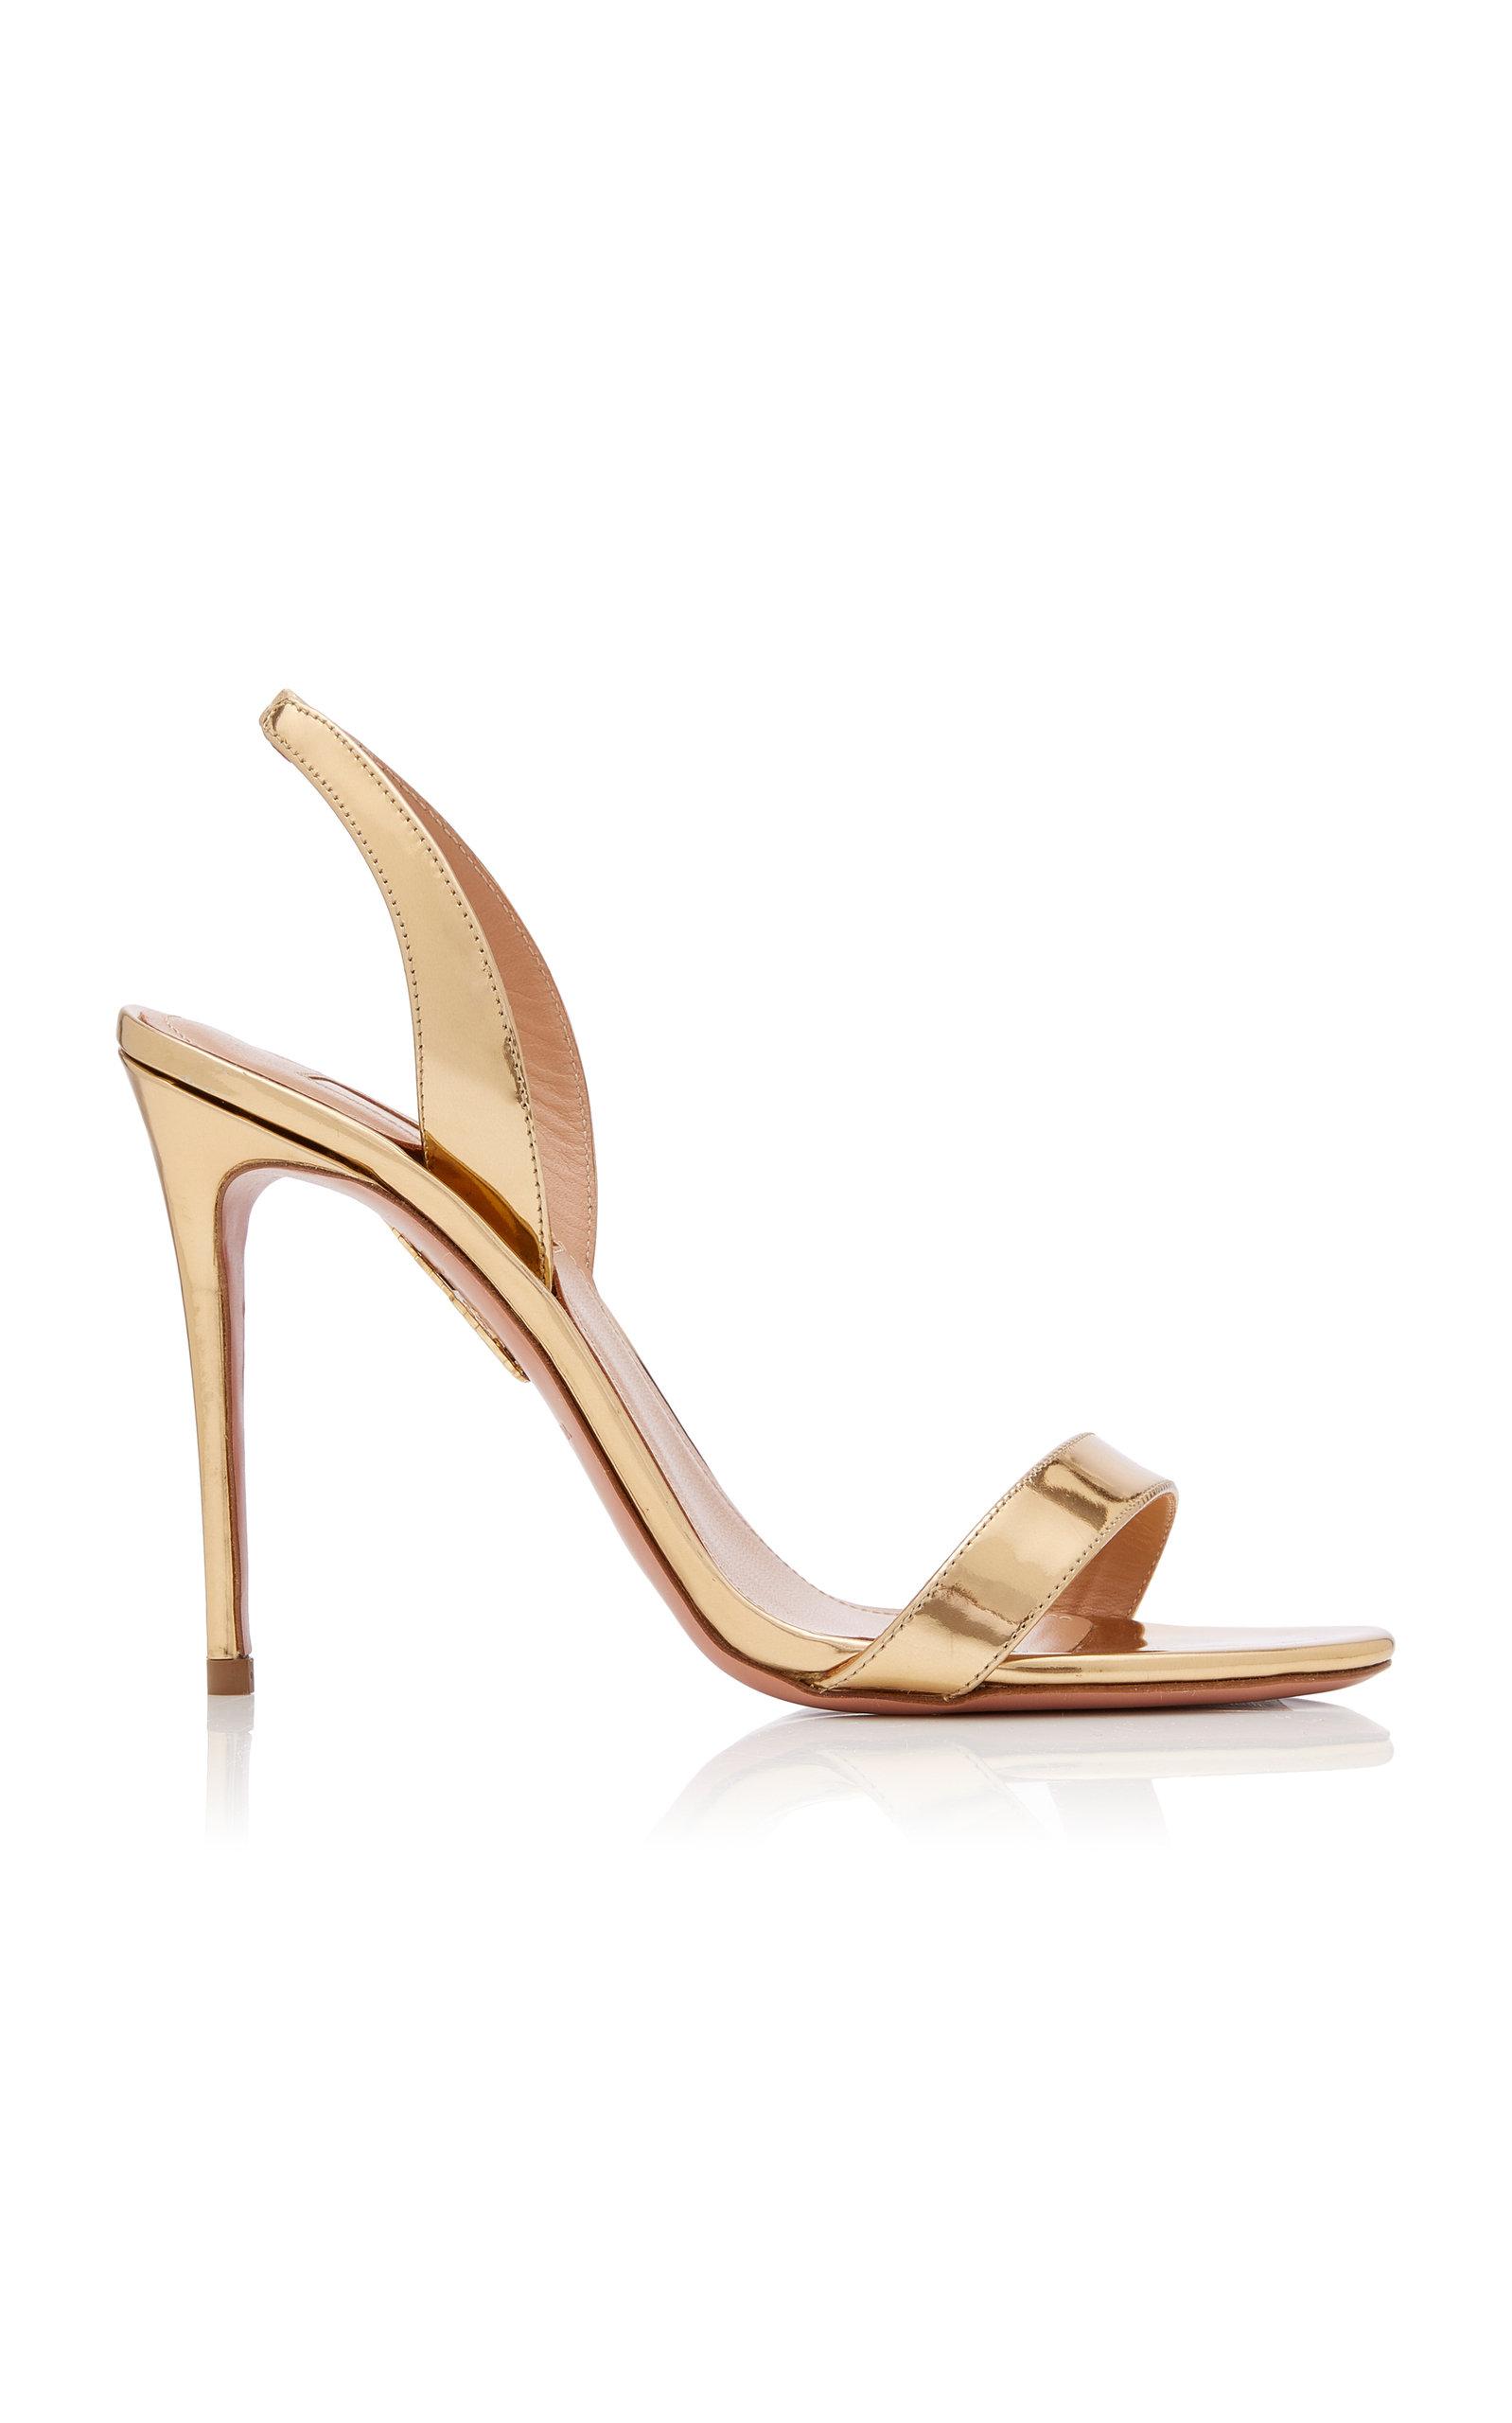 6c7a98c1a So Nude Metallic Leather Slingback Sandals by Aquazzura | Moda Operandi